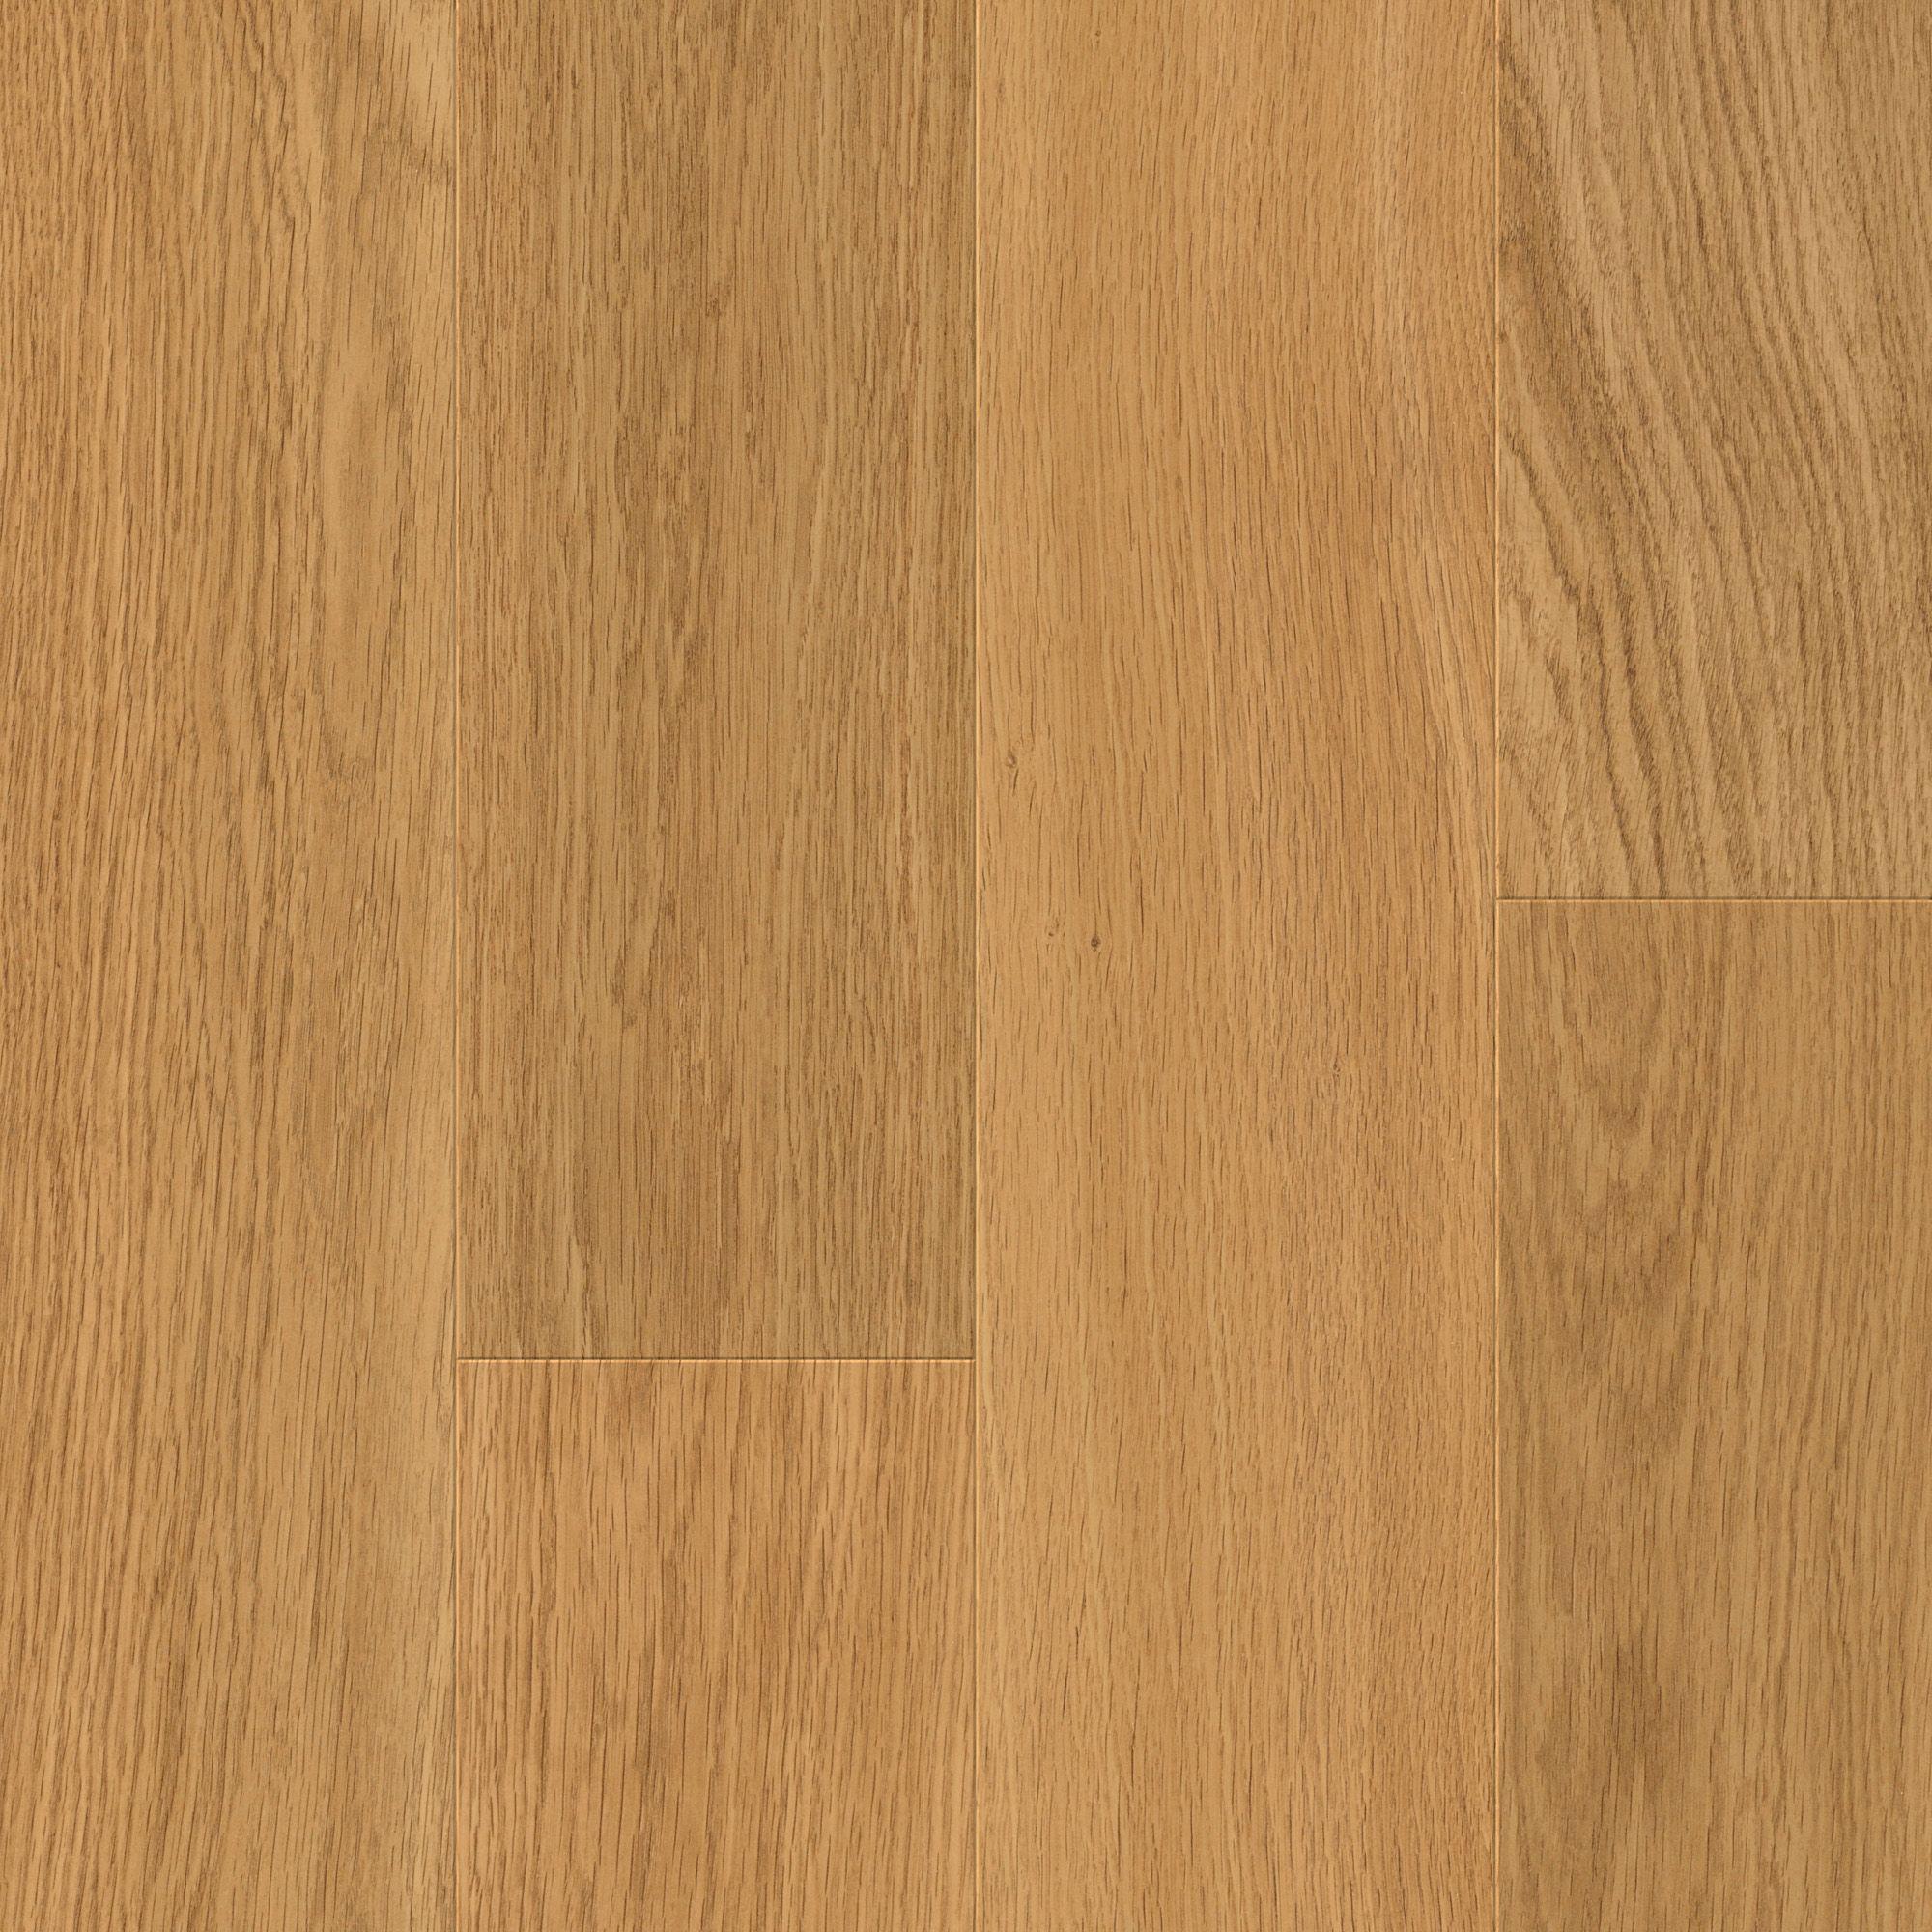 Andante light oak effect laminate flooring sample for B q laminate flooring